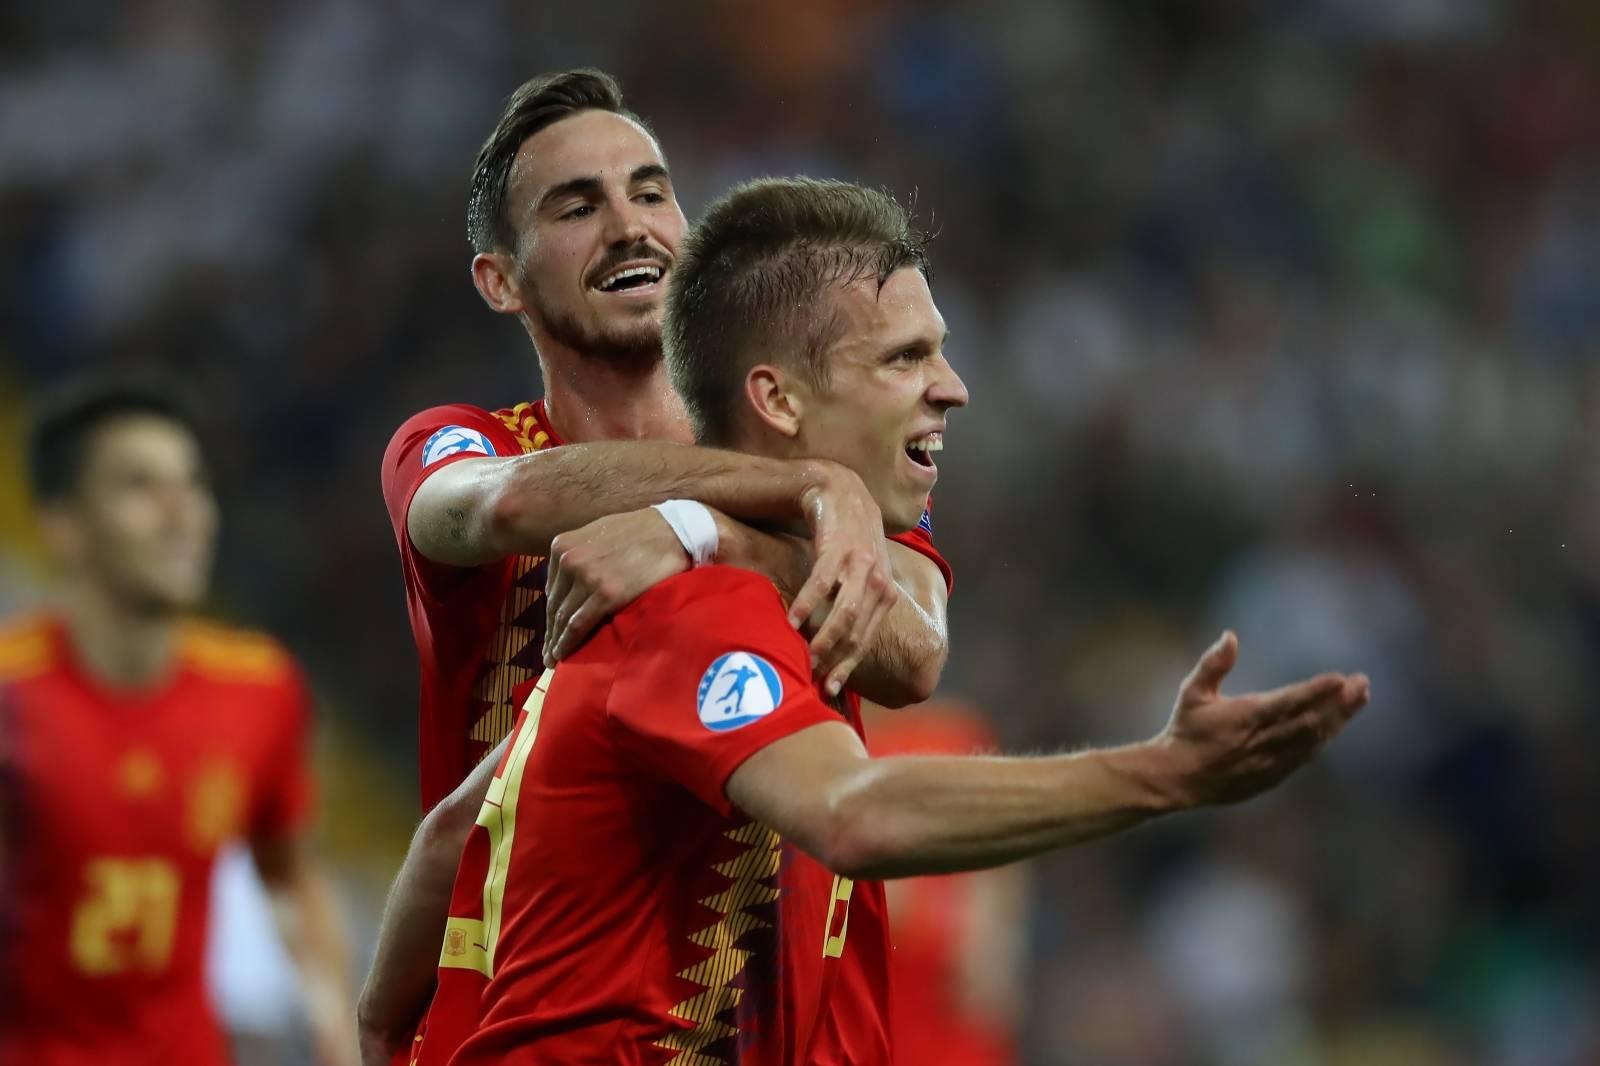 Spain U21 v Germany U21 - UEFA European Under-21 Championship - Final - Stadio Friuli